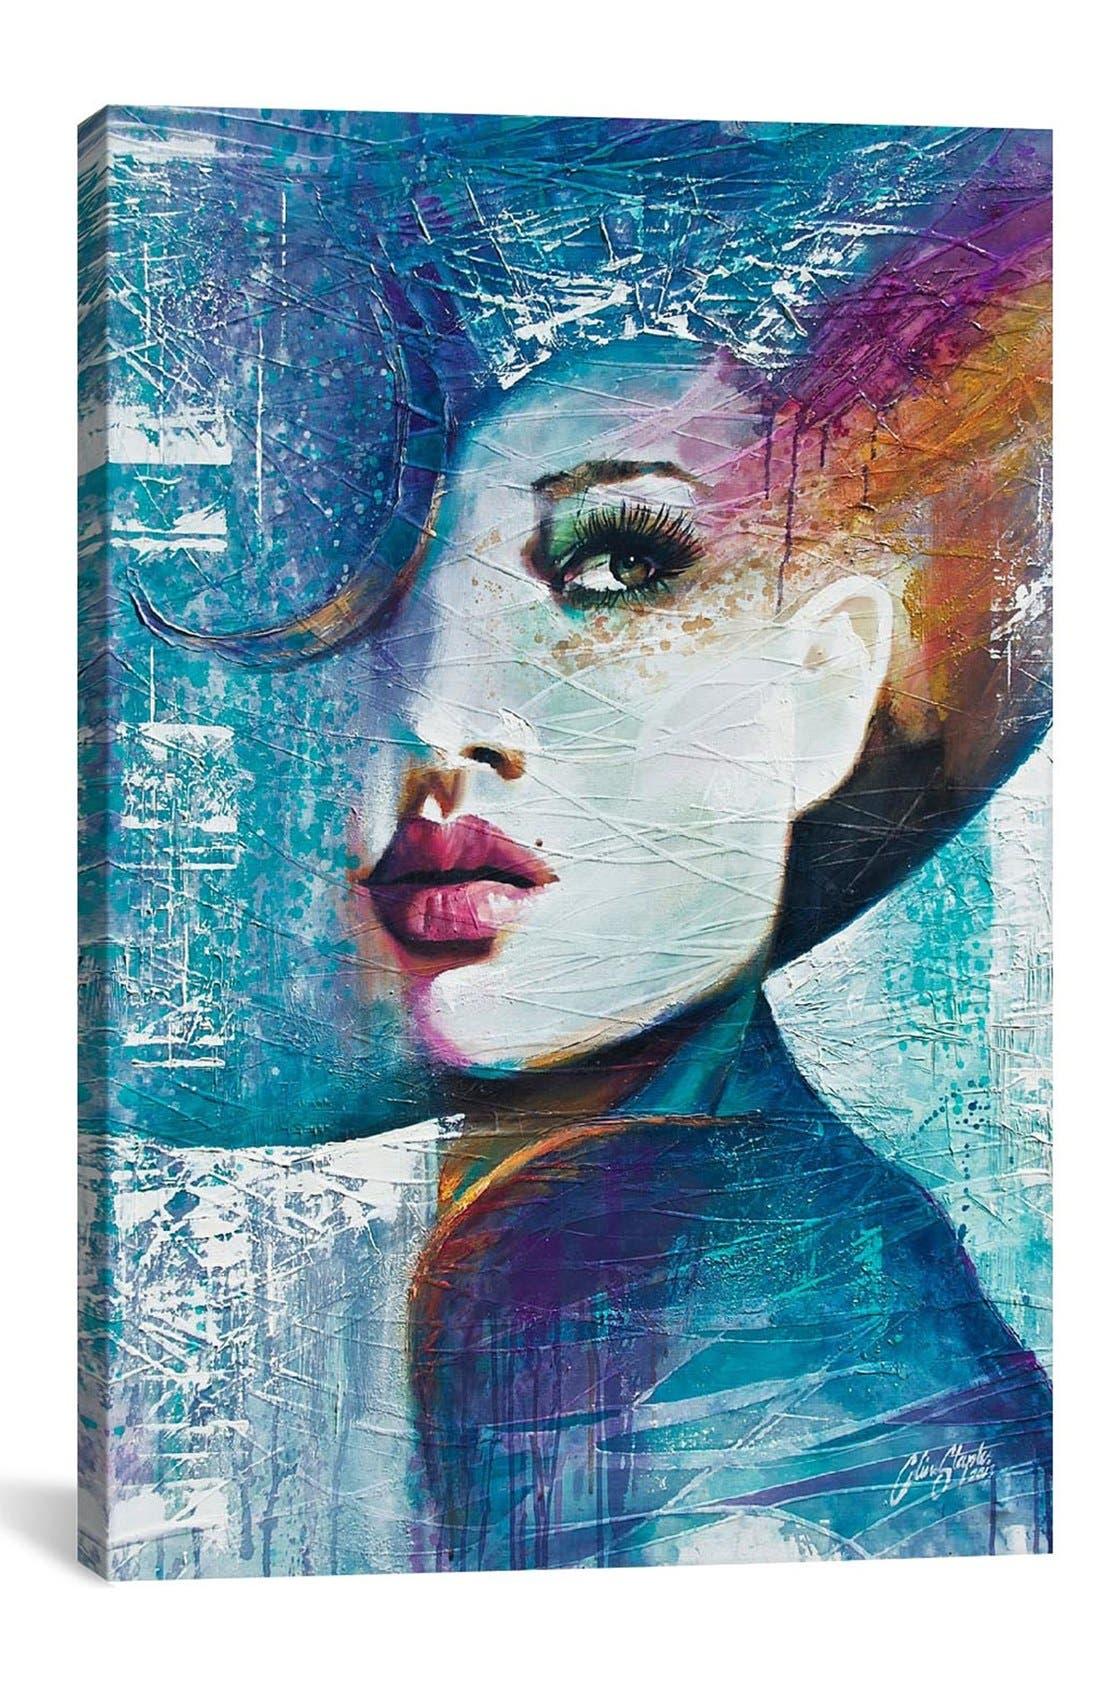 Alternate Image 1 Selected - iCanvas 'Angie - Collin Staples' Giclée Print Canvas Art